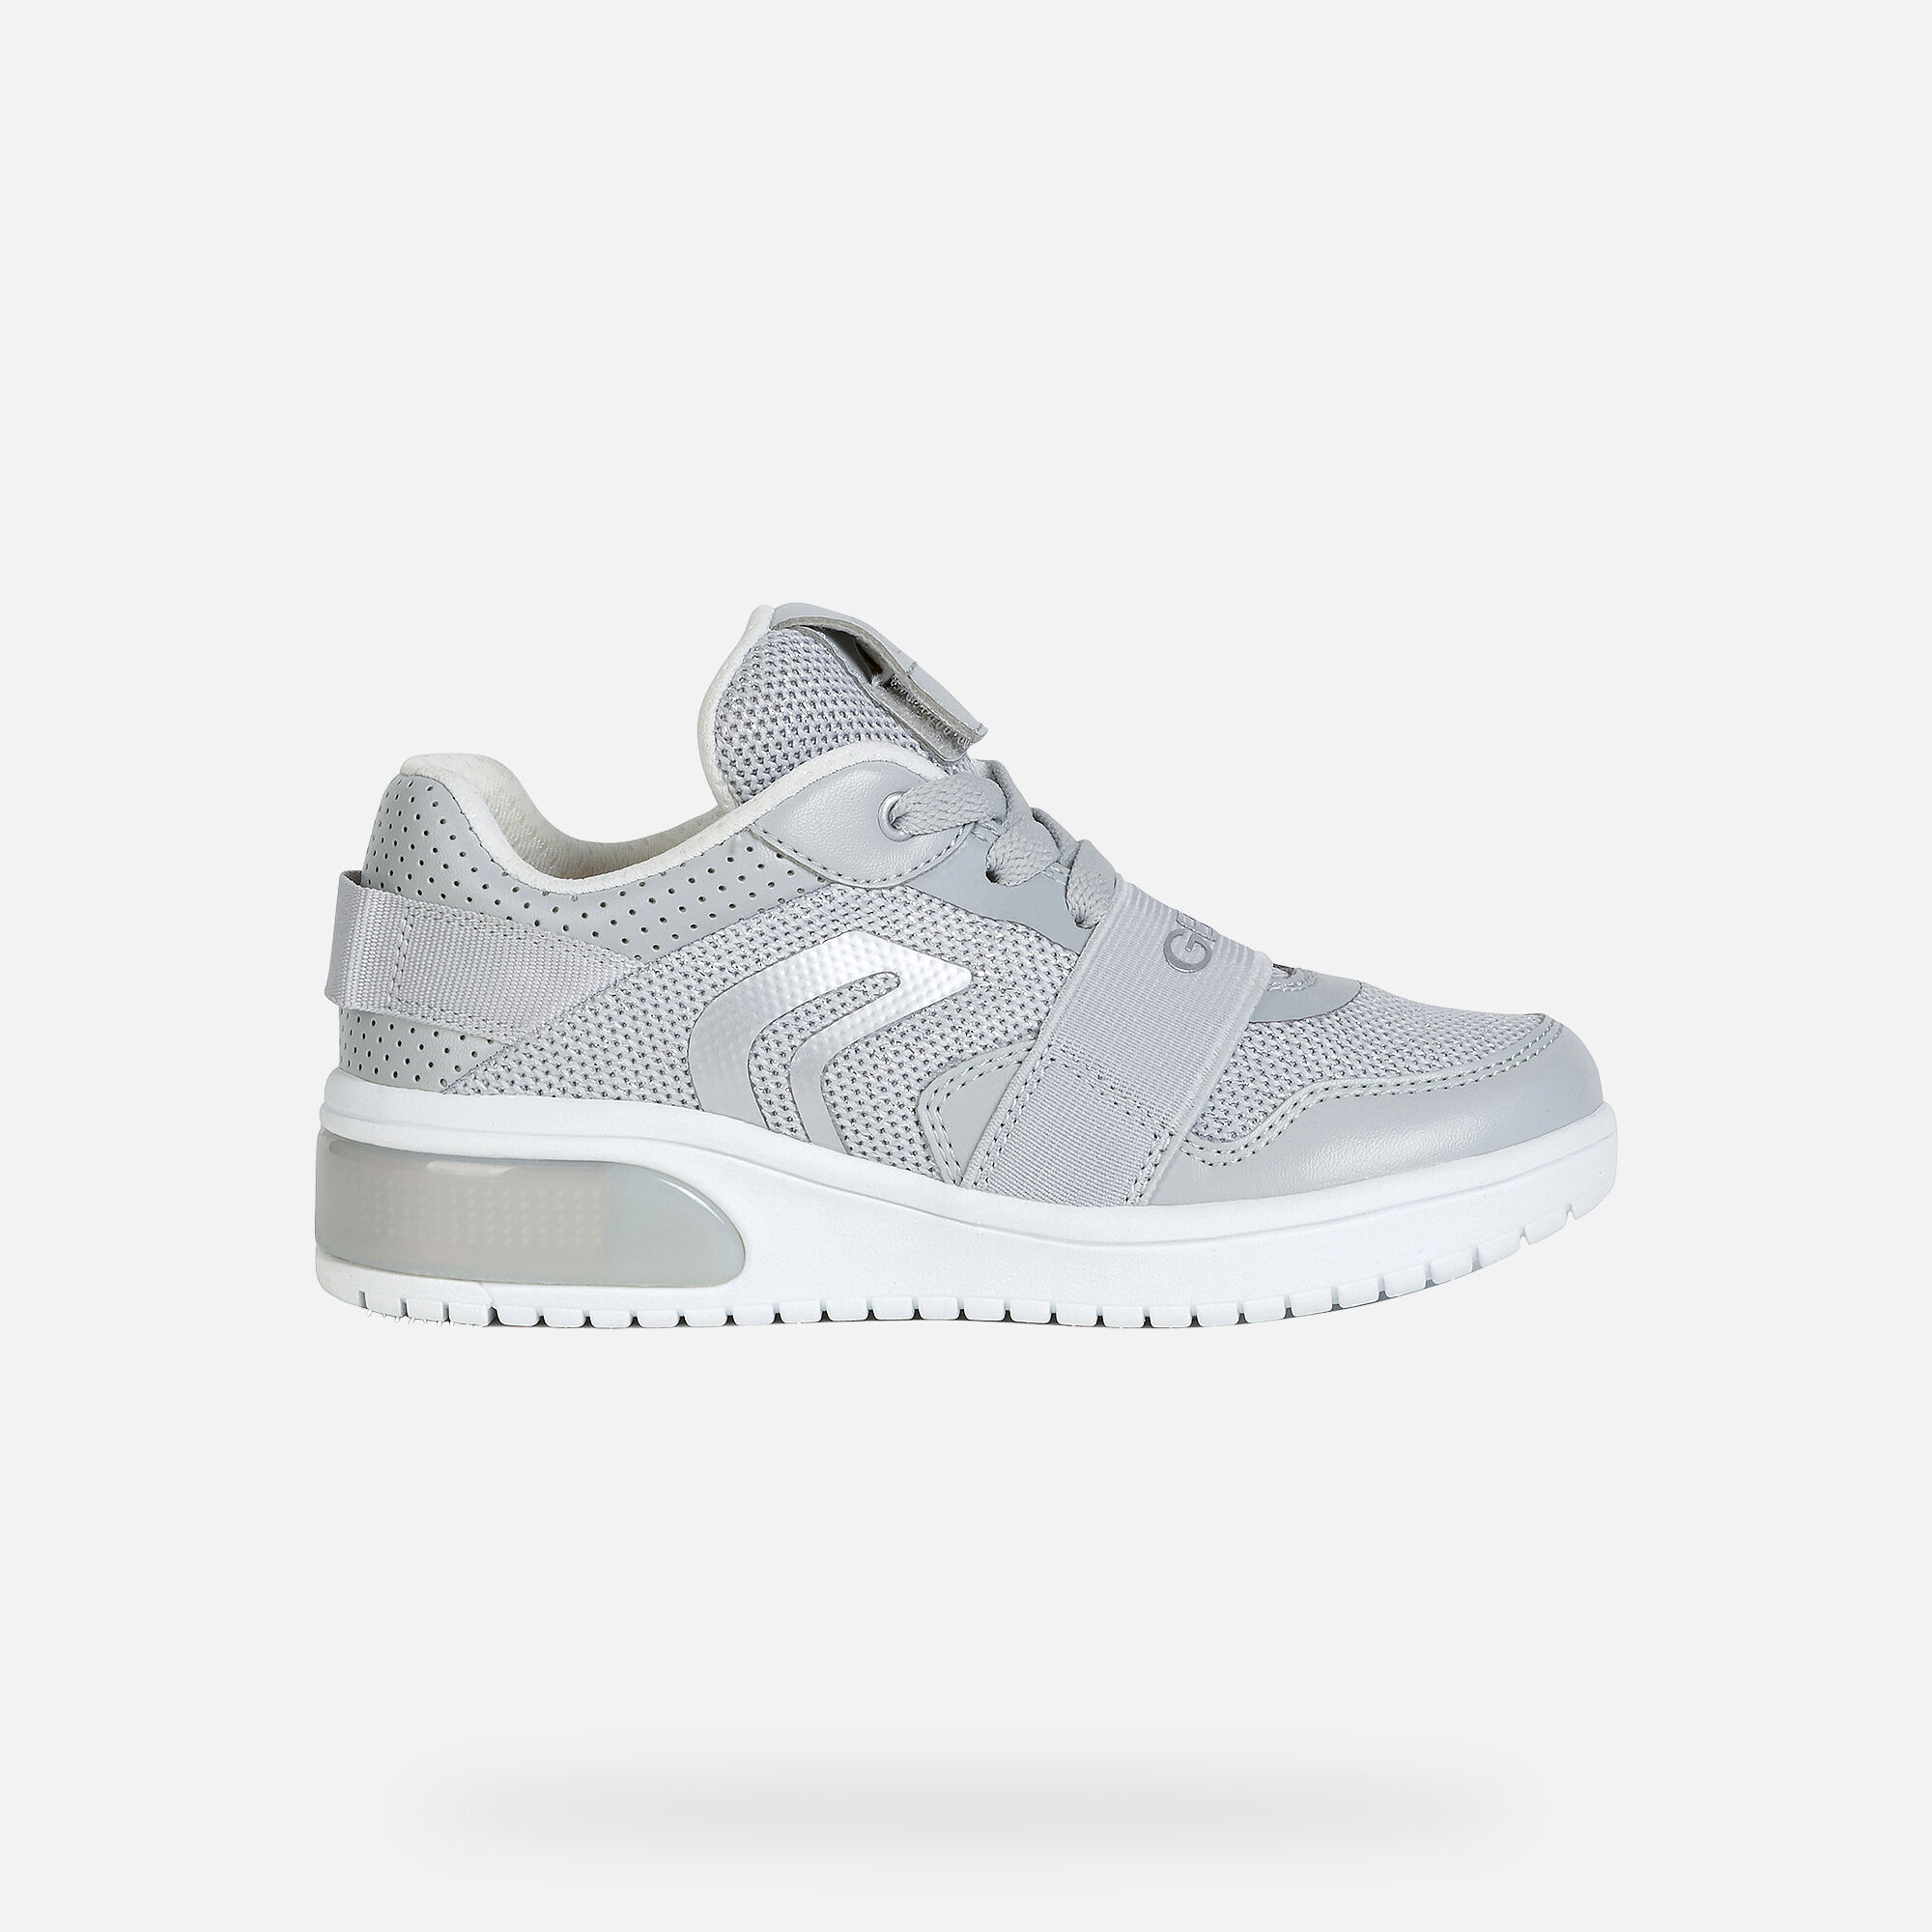 Geox XLED Bambina: Sneakers Grigio chiaro | Geox SS20